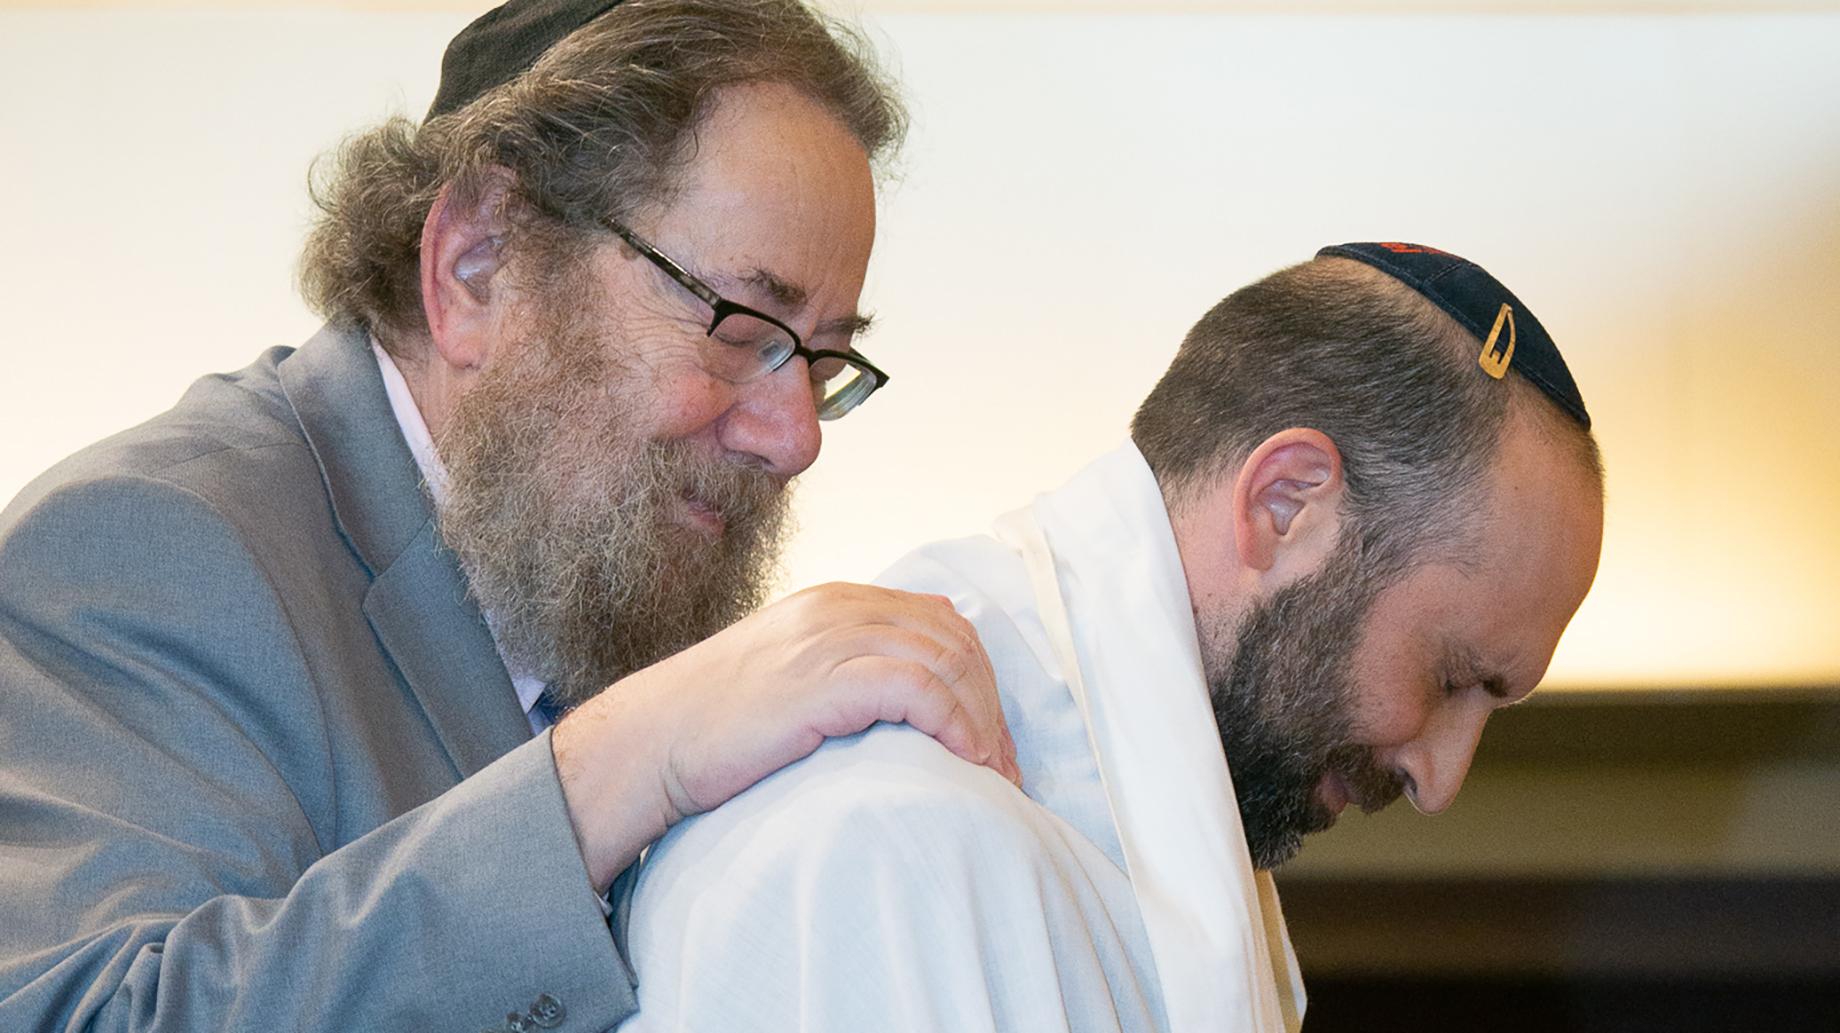 Rabbi Art Green and Rabbi Joel Goldberg